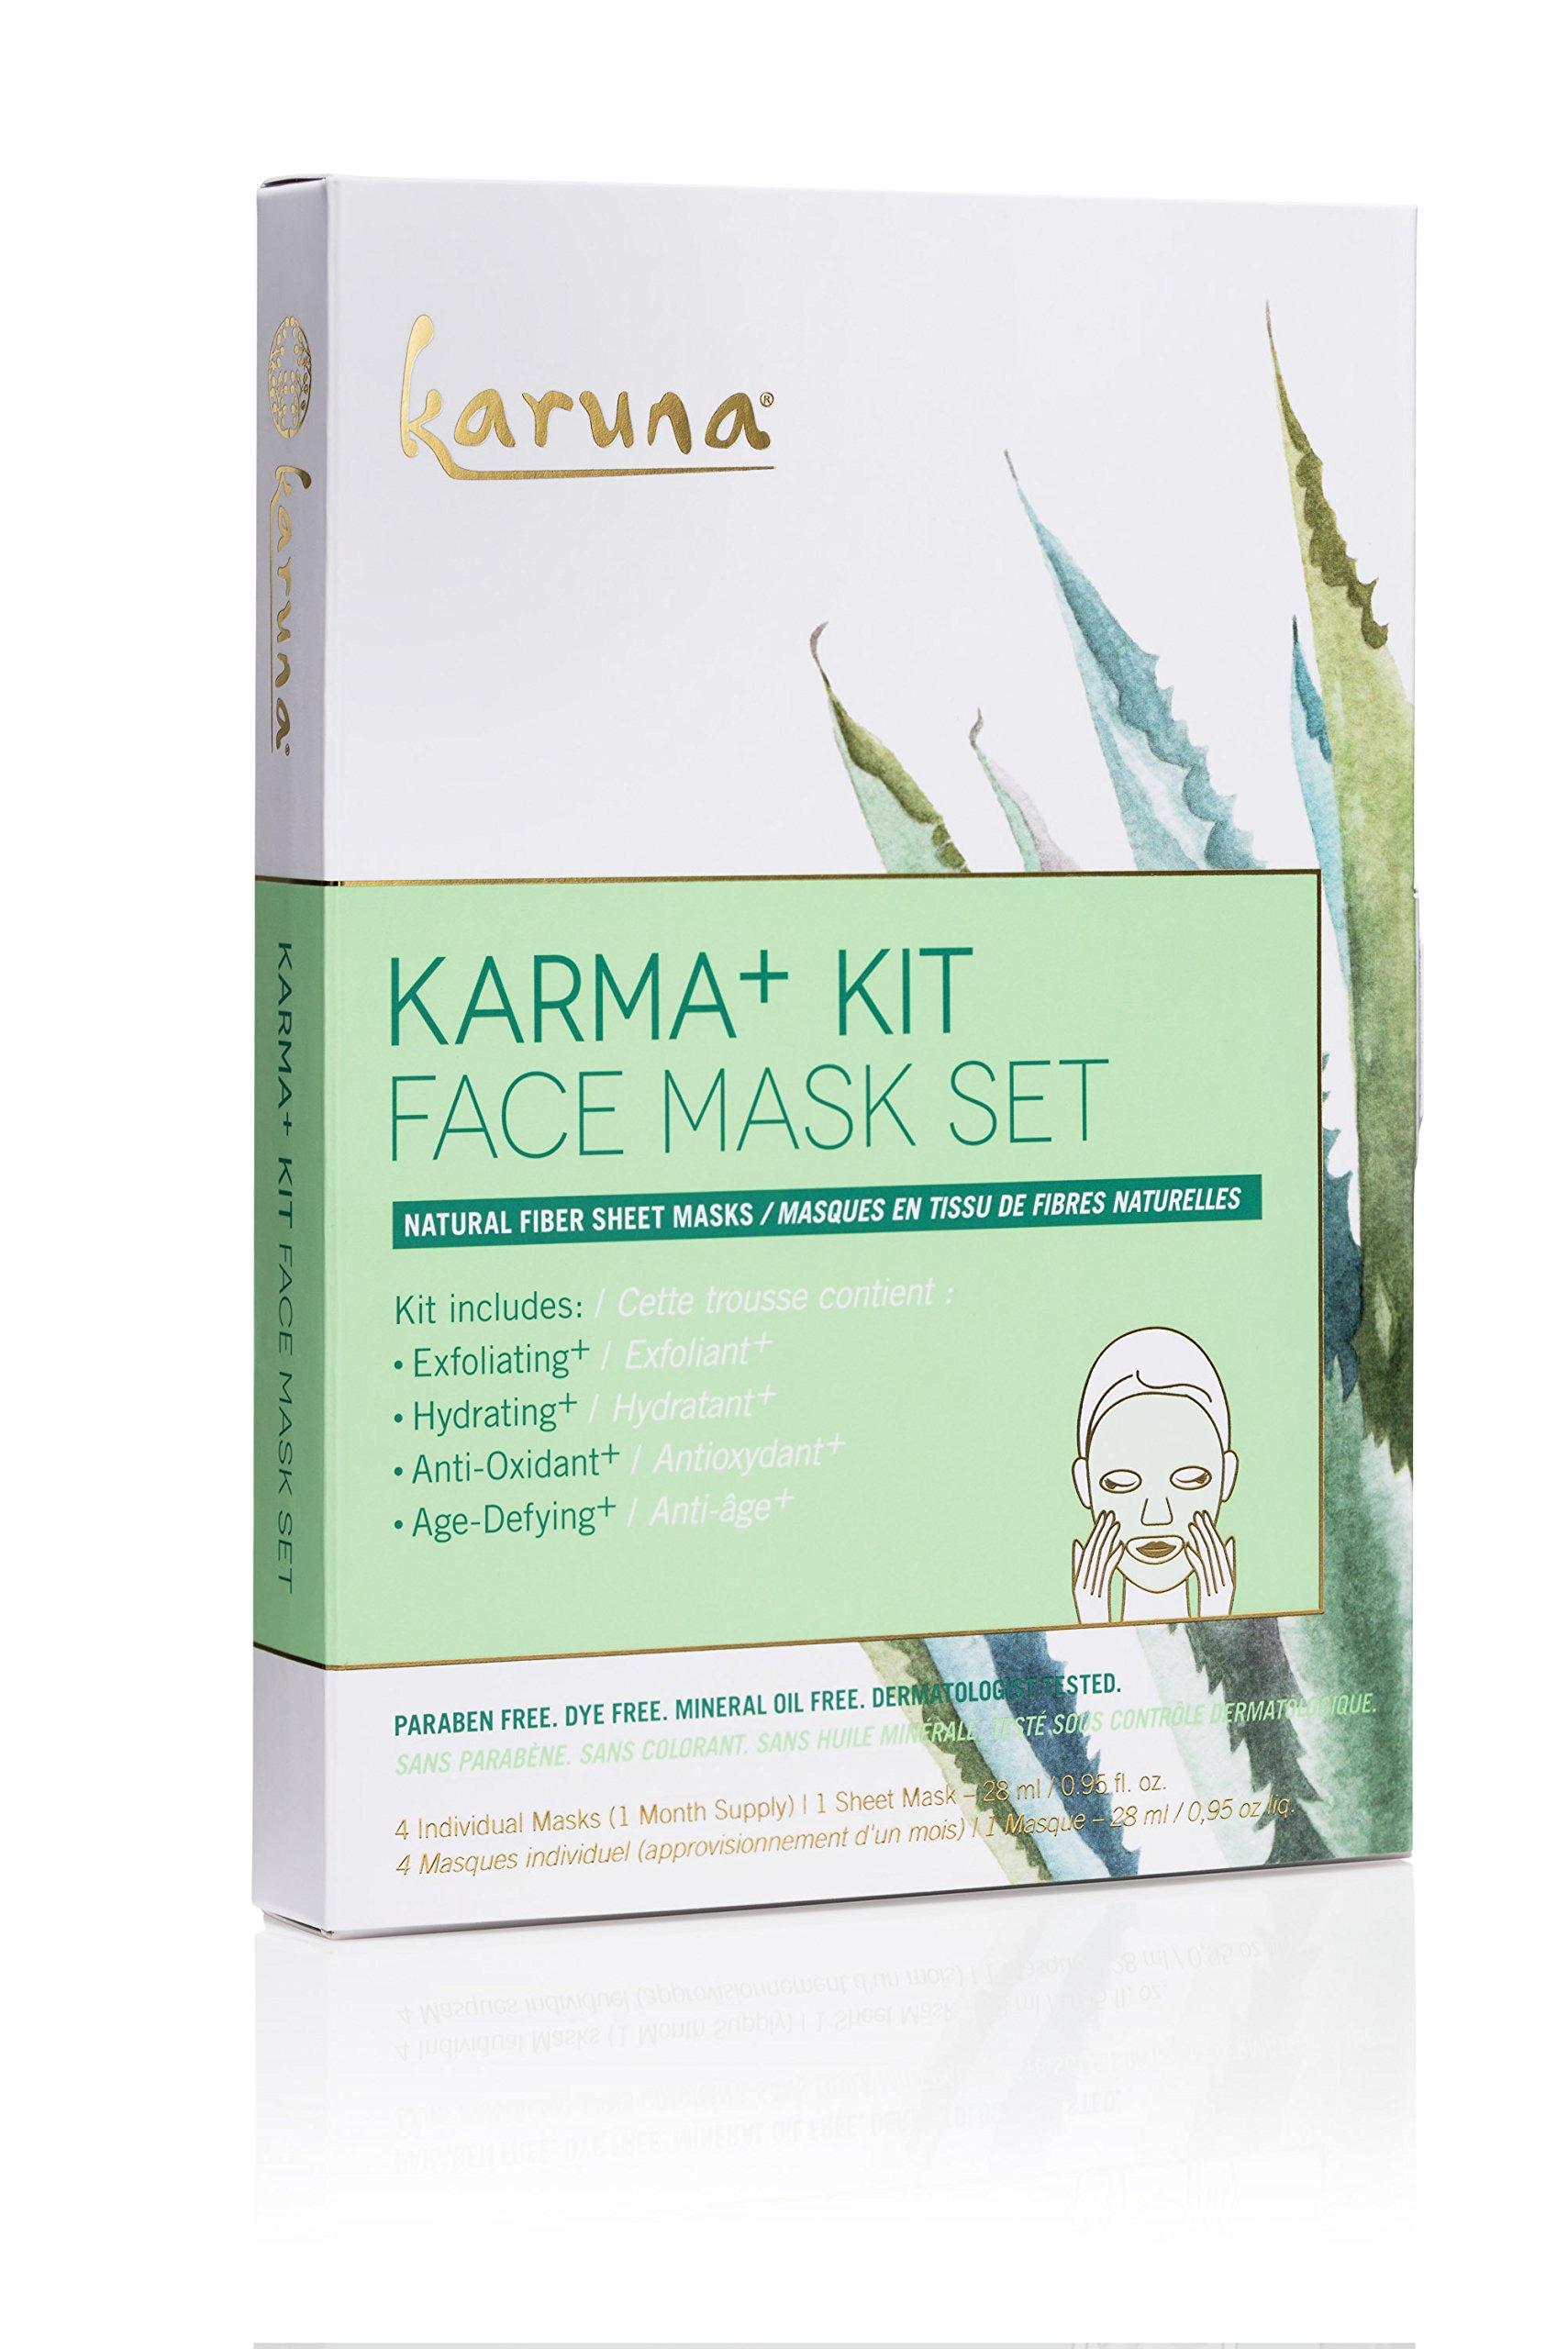 Karuna Karma Kit + Face Mask Set, Pack of 4, 3.8 fl. oz.